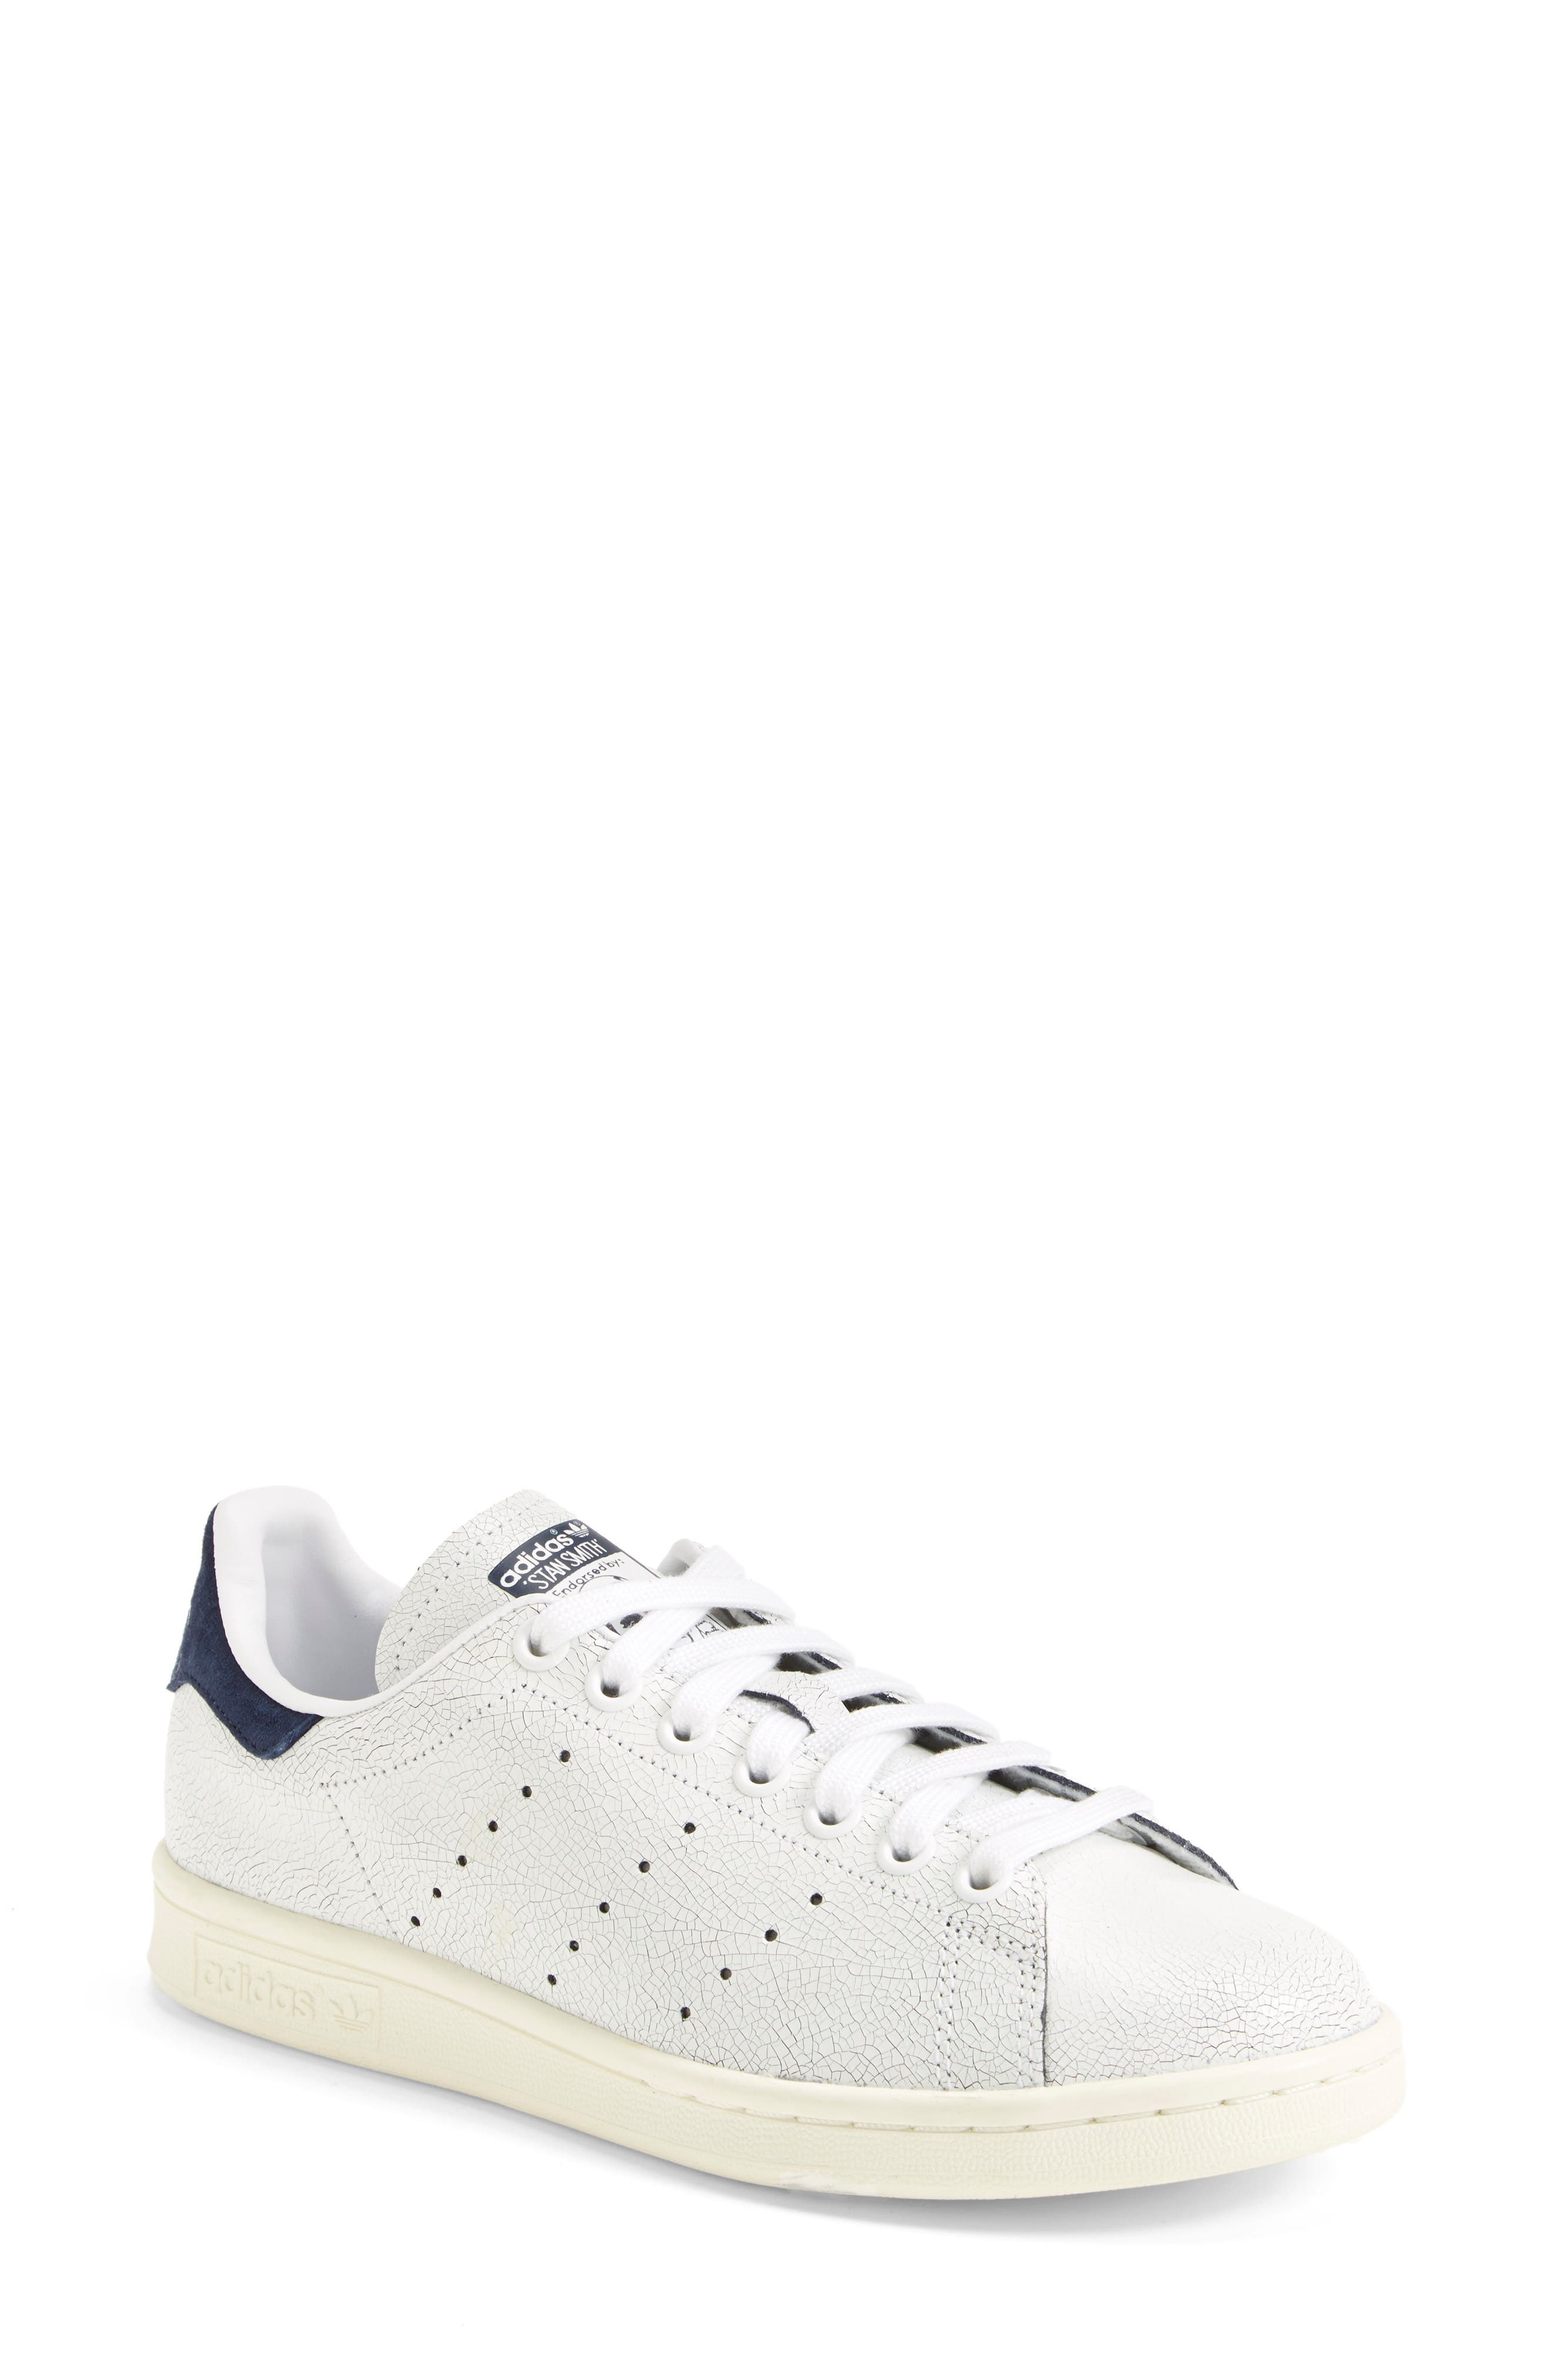 'Stan Smith' Sneaker,                             Alternate thumbnail 86, color,